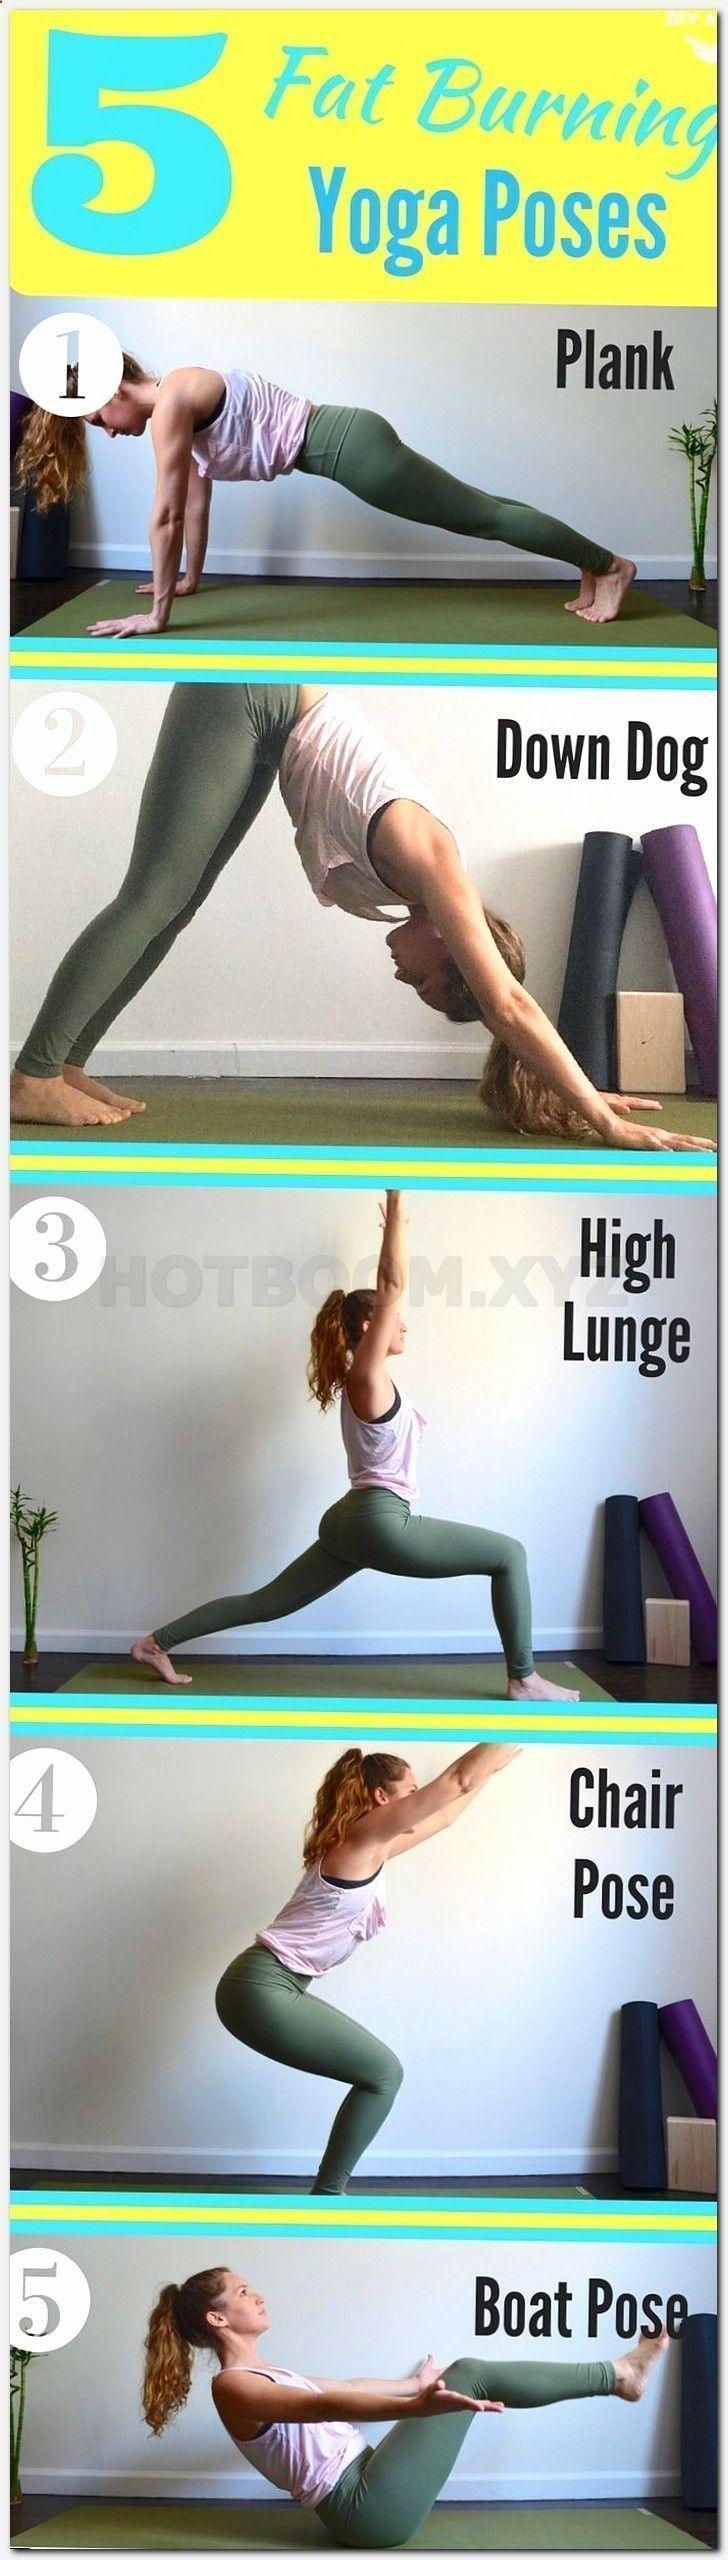 Easy yoga workout ramdev baba yoga tips acupuncture diabetes easy yoga workout ramdev baba yoga tips acupuncture diabetes yoga moves beginner bikram yoga benefits skin losing belly fat for men ramdev y ccuart Images